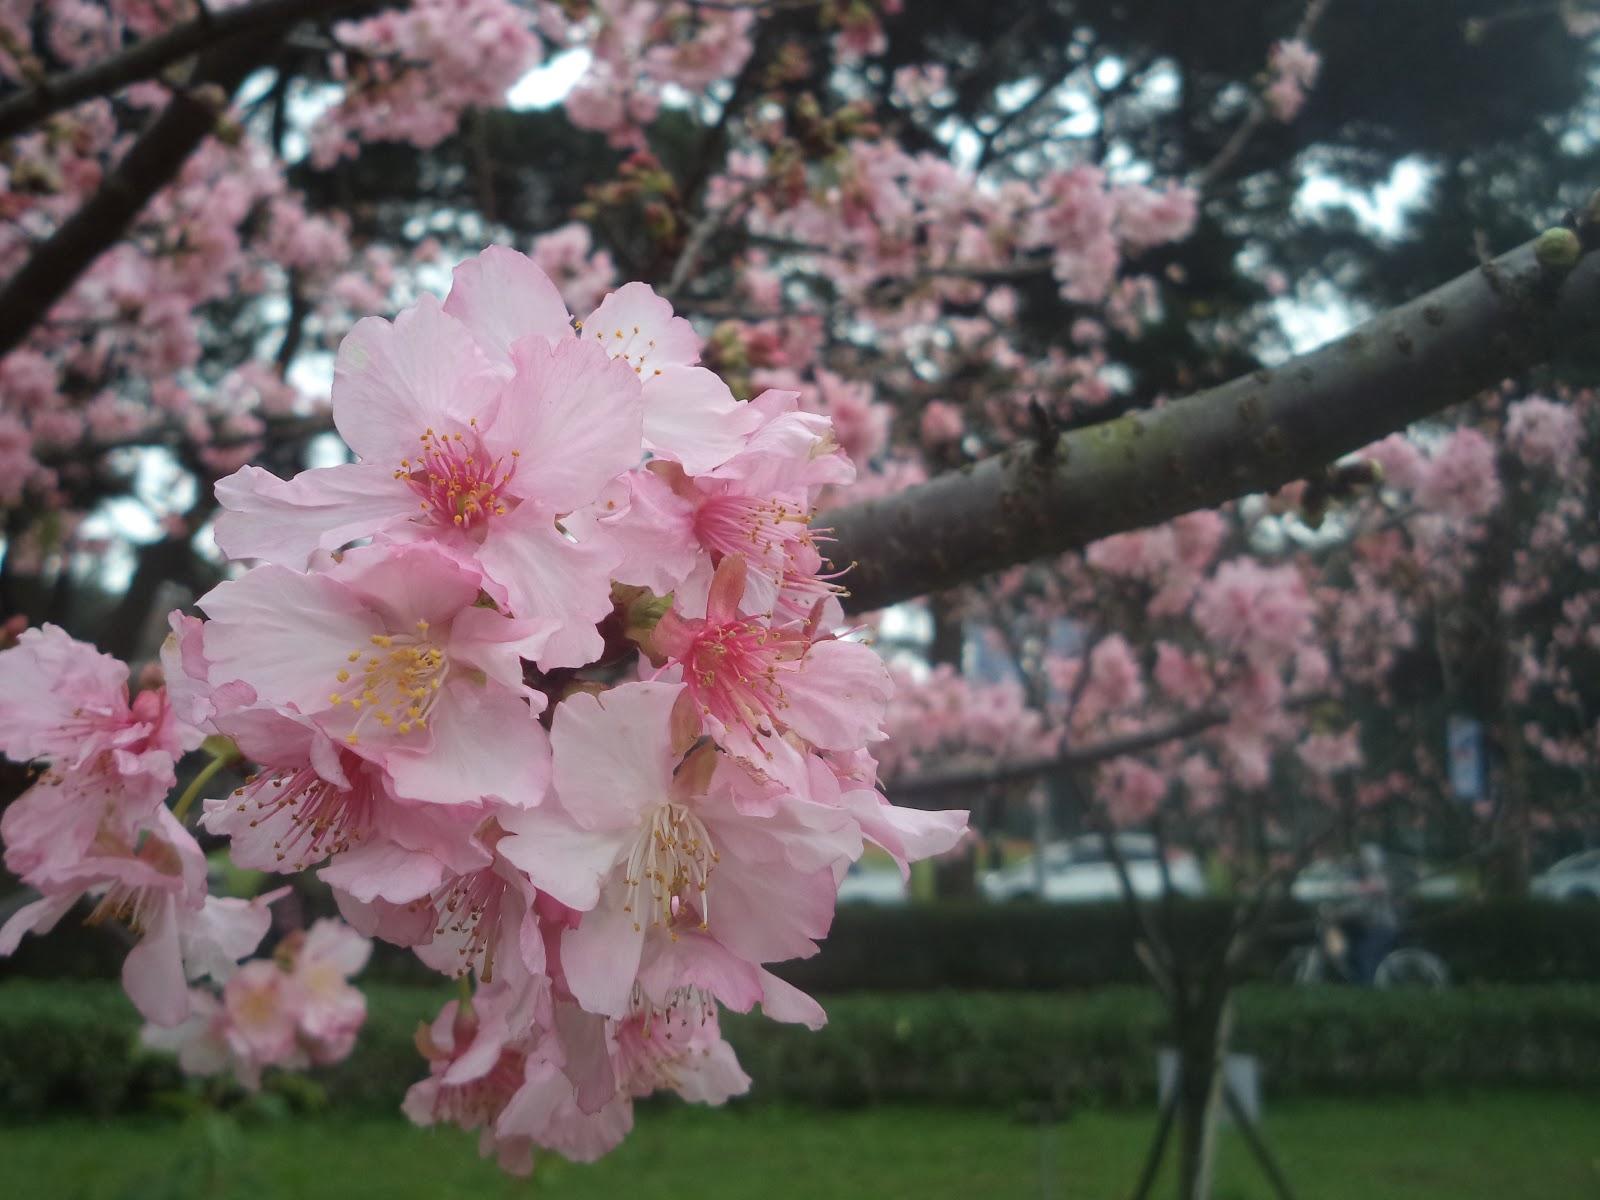 Menikmati Bunga Sakura Awal Musim Semi Di Taiwan